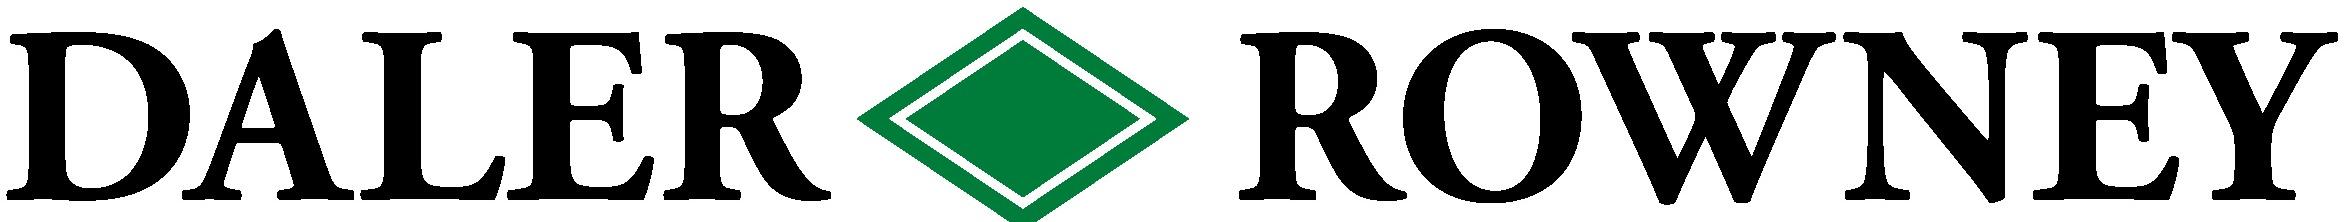 daler-rowney-logo3.jpg